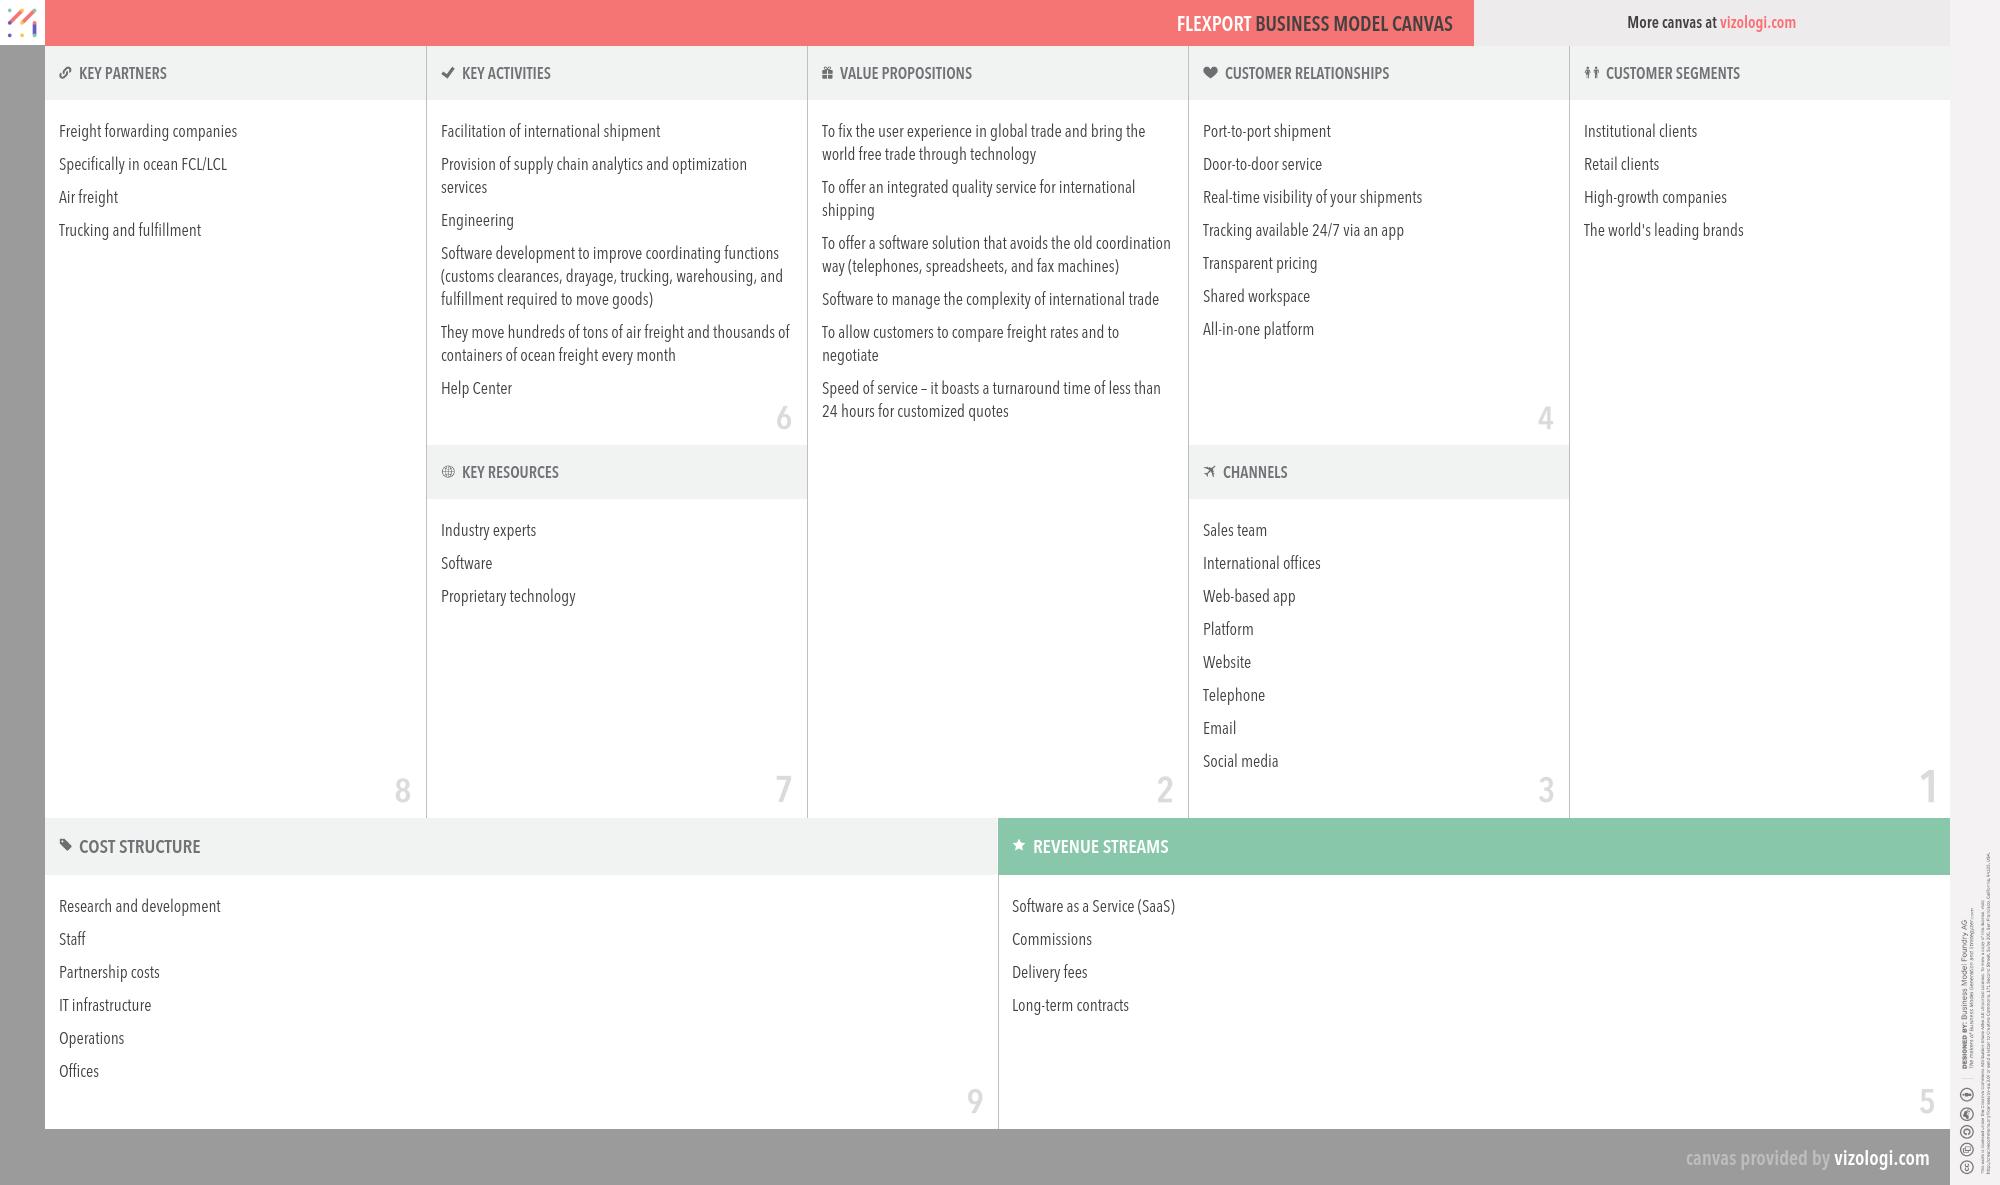 Flexport Business Model Canvas Business Model Canvas Business Model Canvas Examples Online Business Models